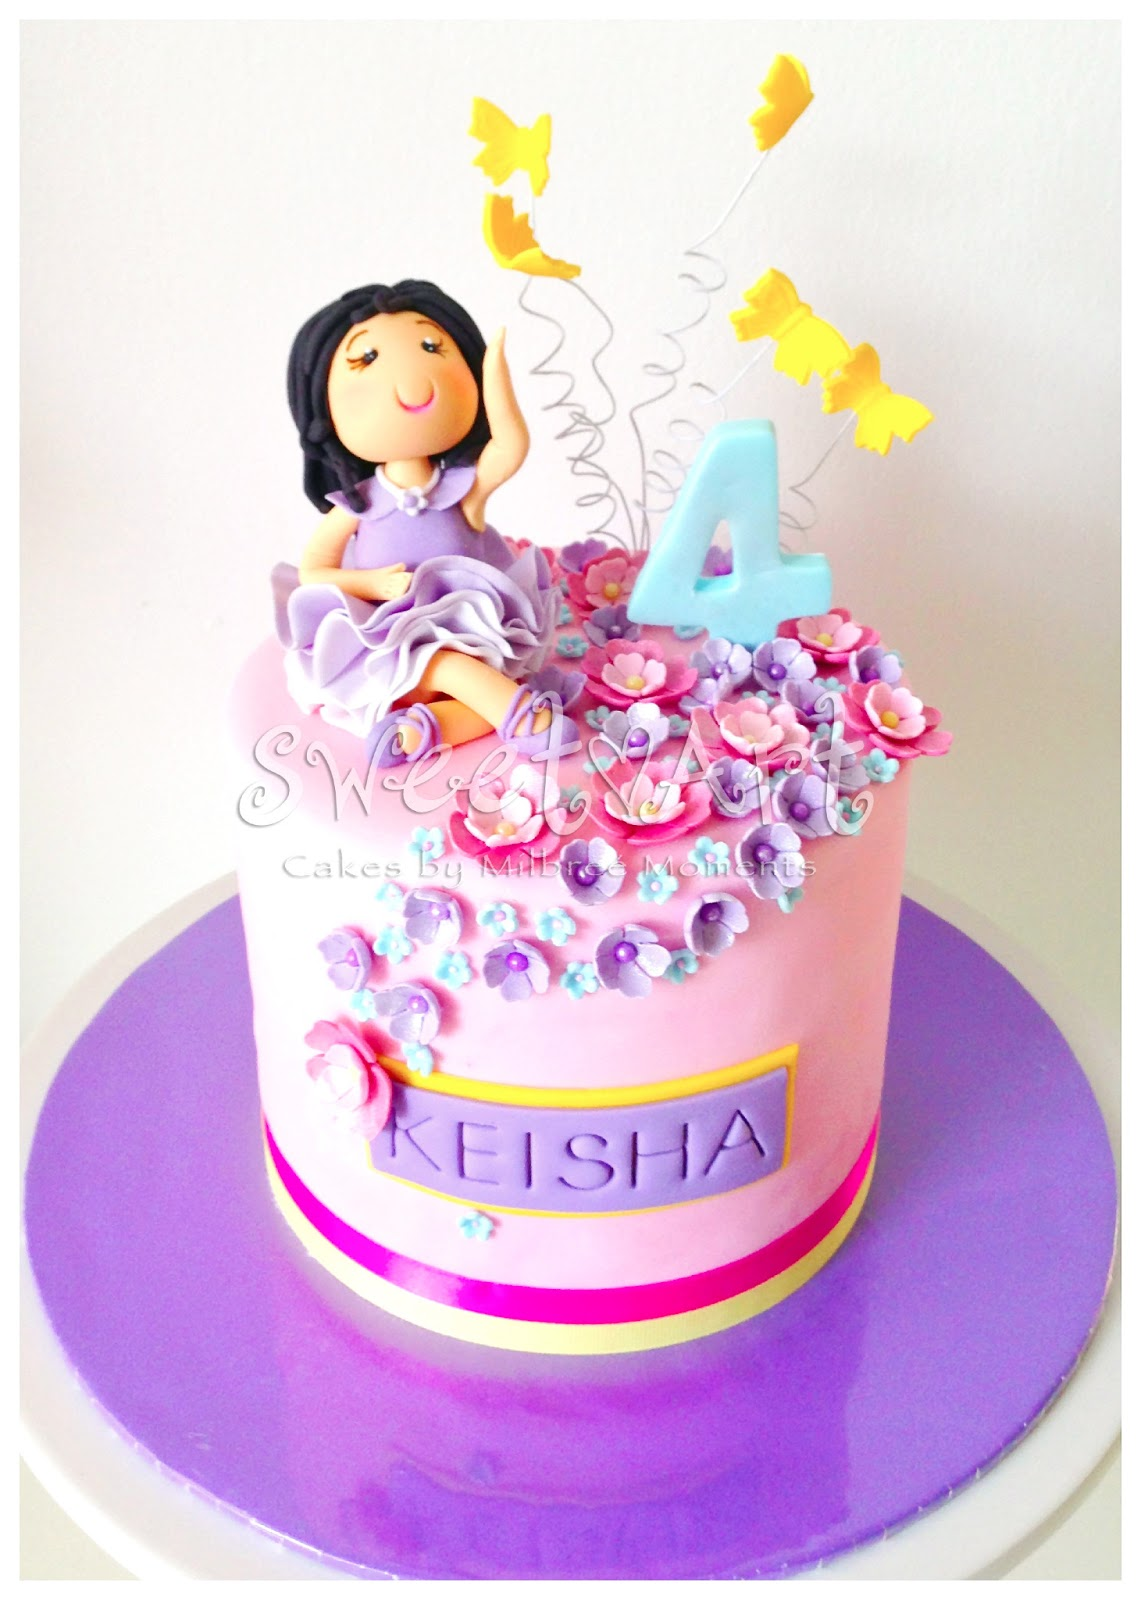 Sweet Art Cakes By Milbre 233 Moments Keisha S Ballerina 4th